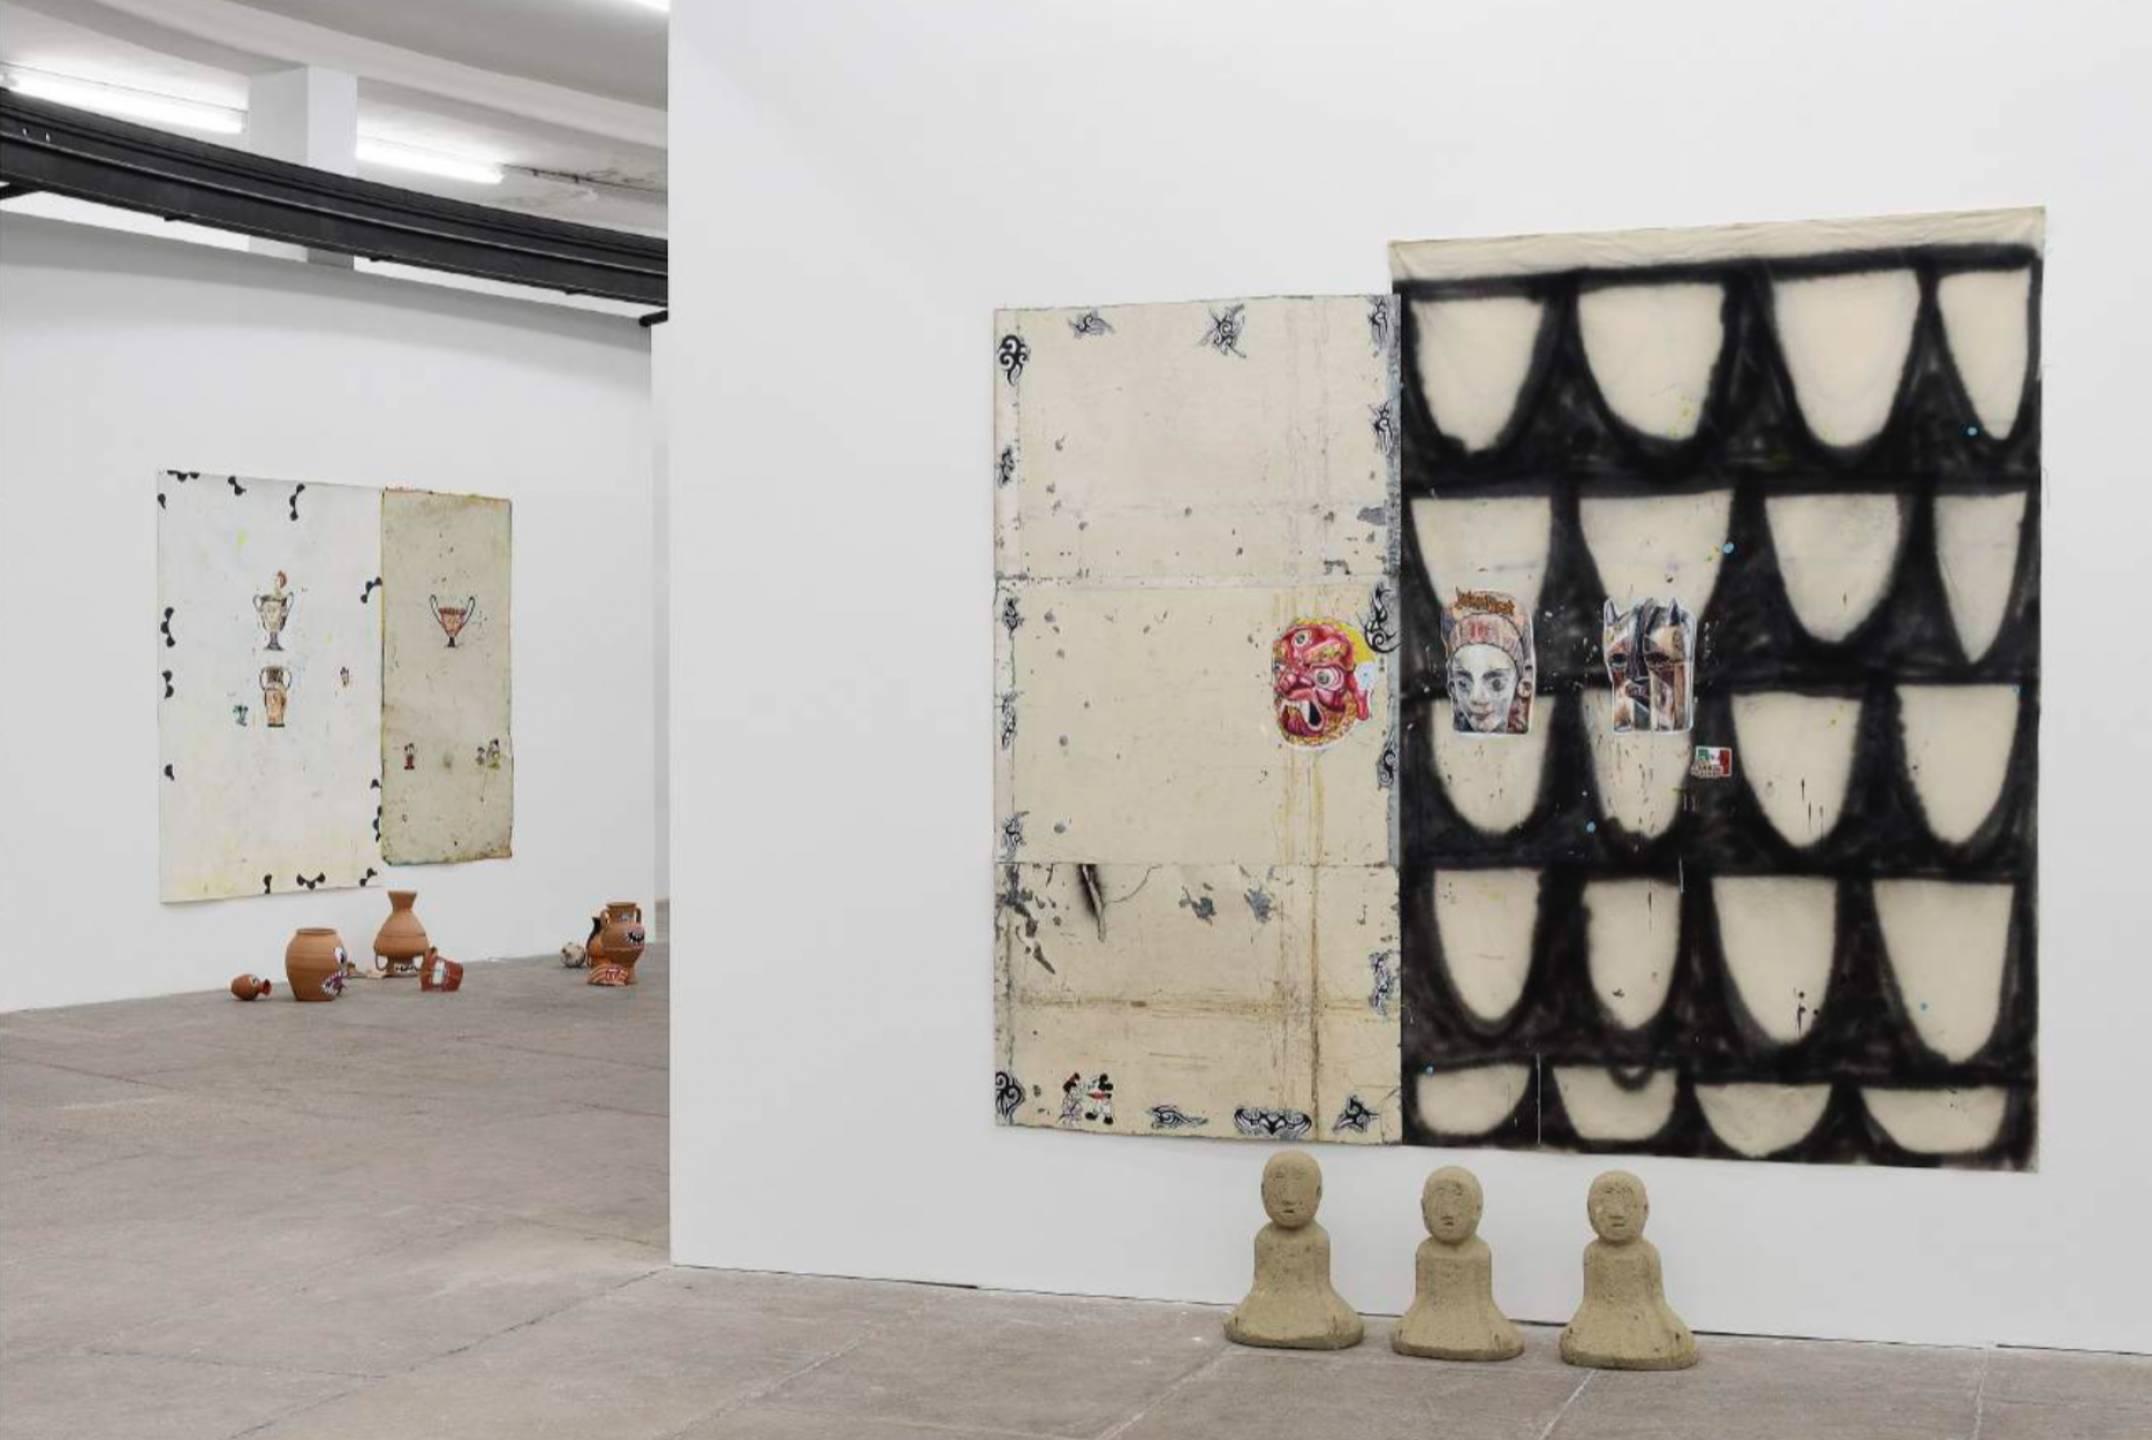 Paulo Nimer Pjota,&nbsp;<em>The history in repeat mode — Drama</em>,&nbsp;T293, Rome, 2017 - Mendes Wood DM